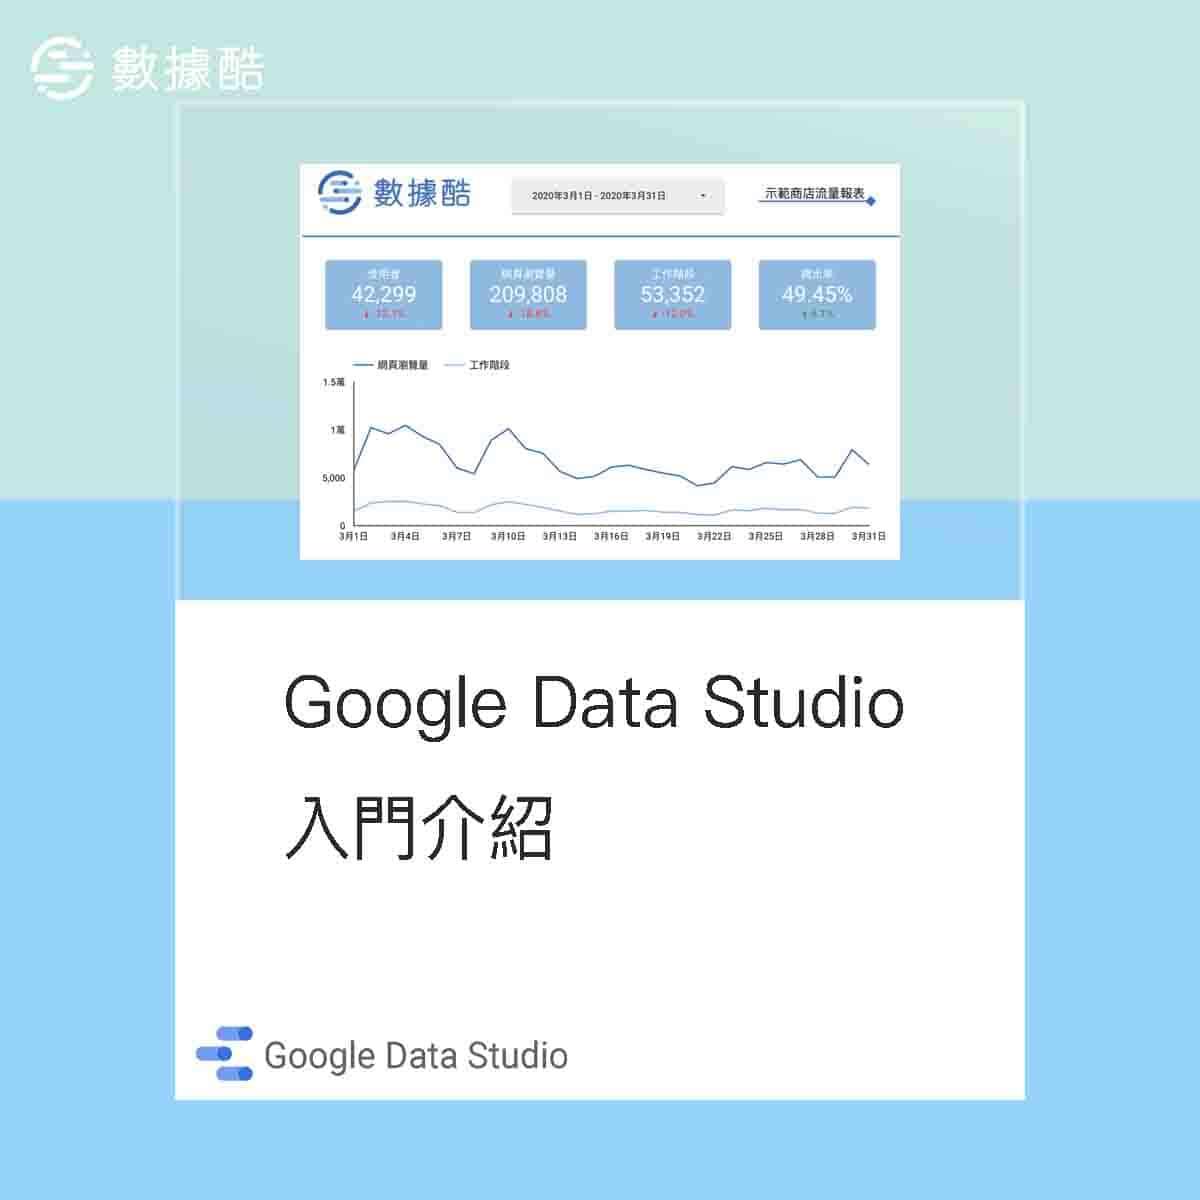 Google Data Studio 介紹